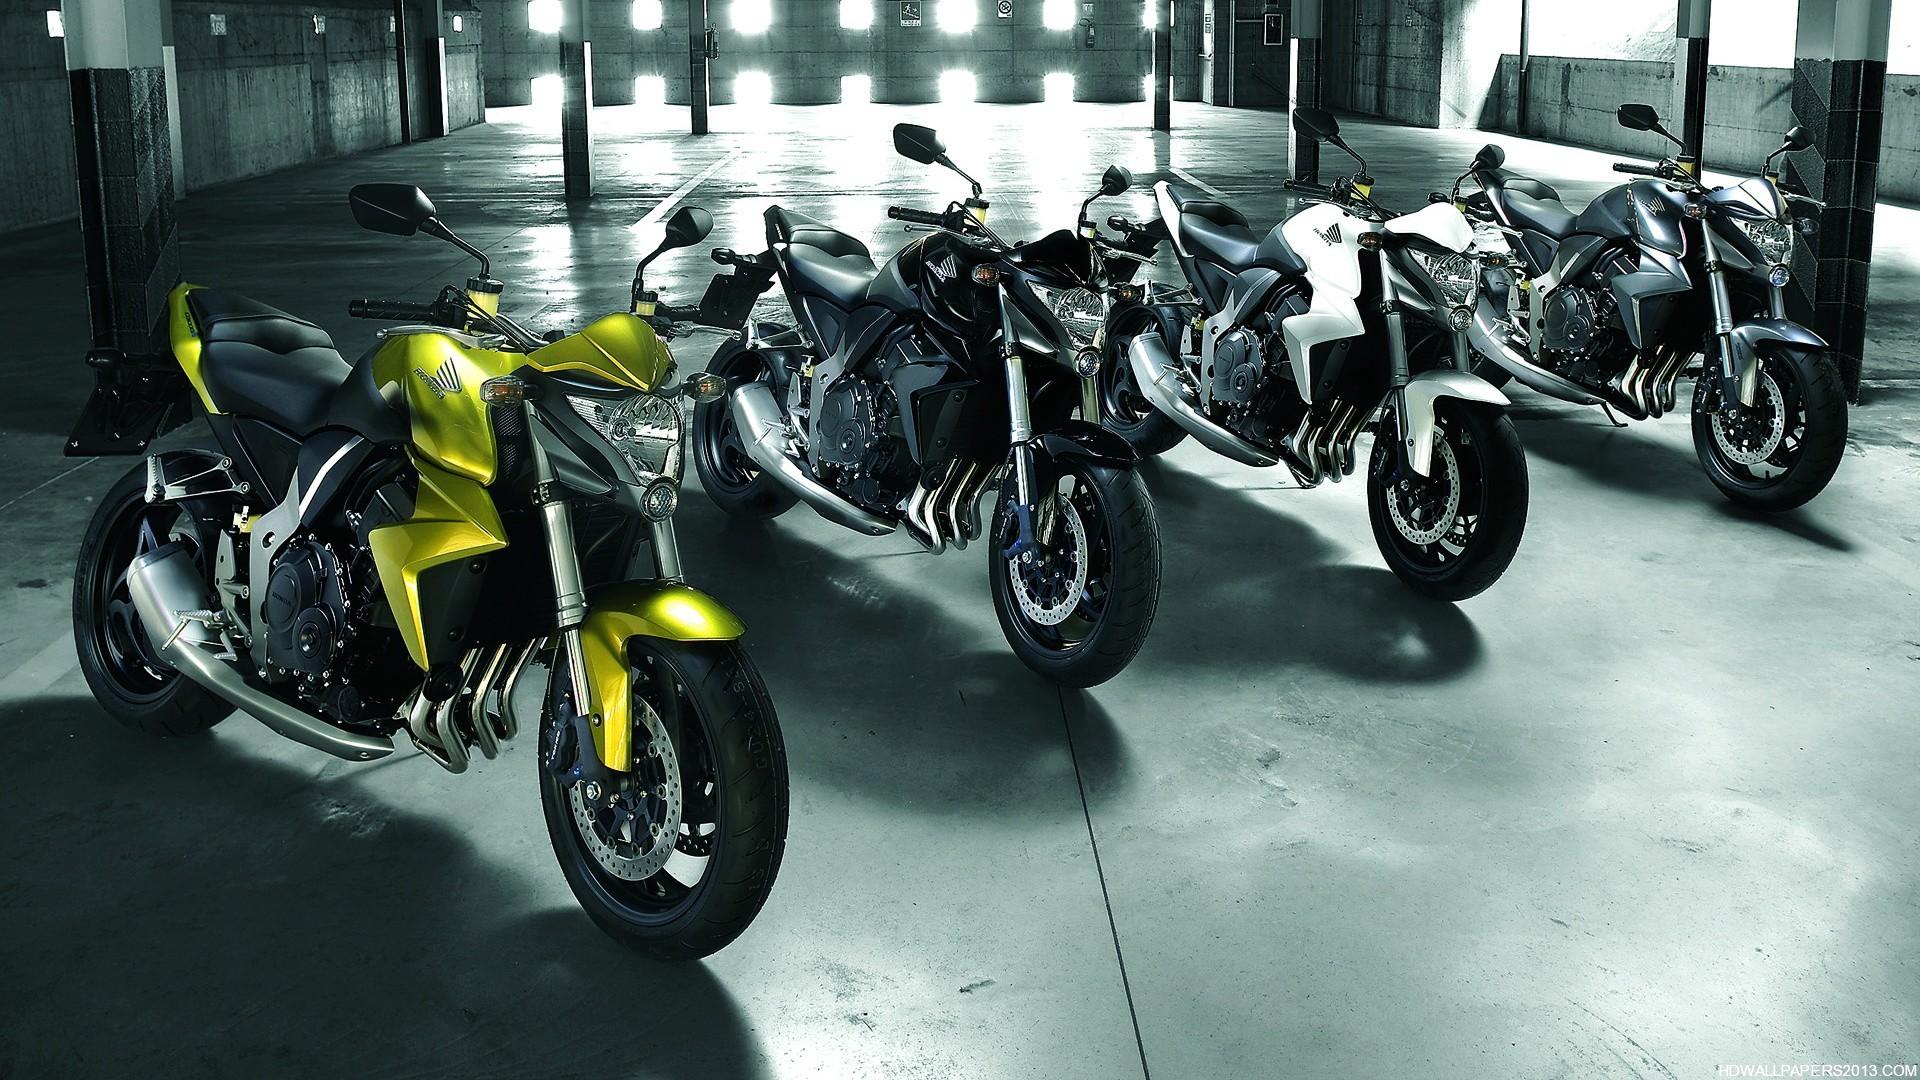 Hd Motorcycle Wallpaper Wallpapers